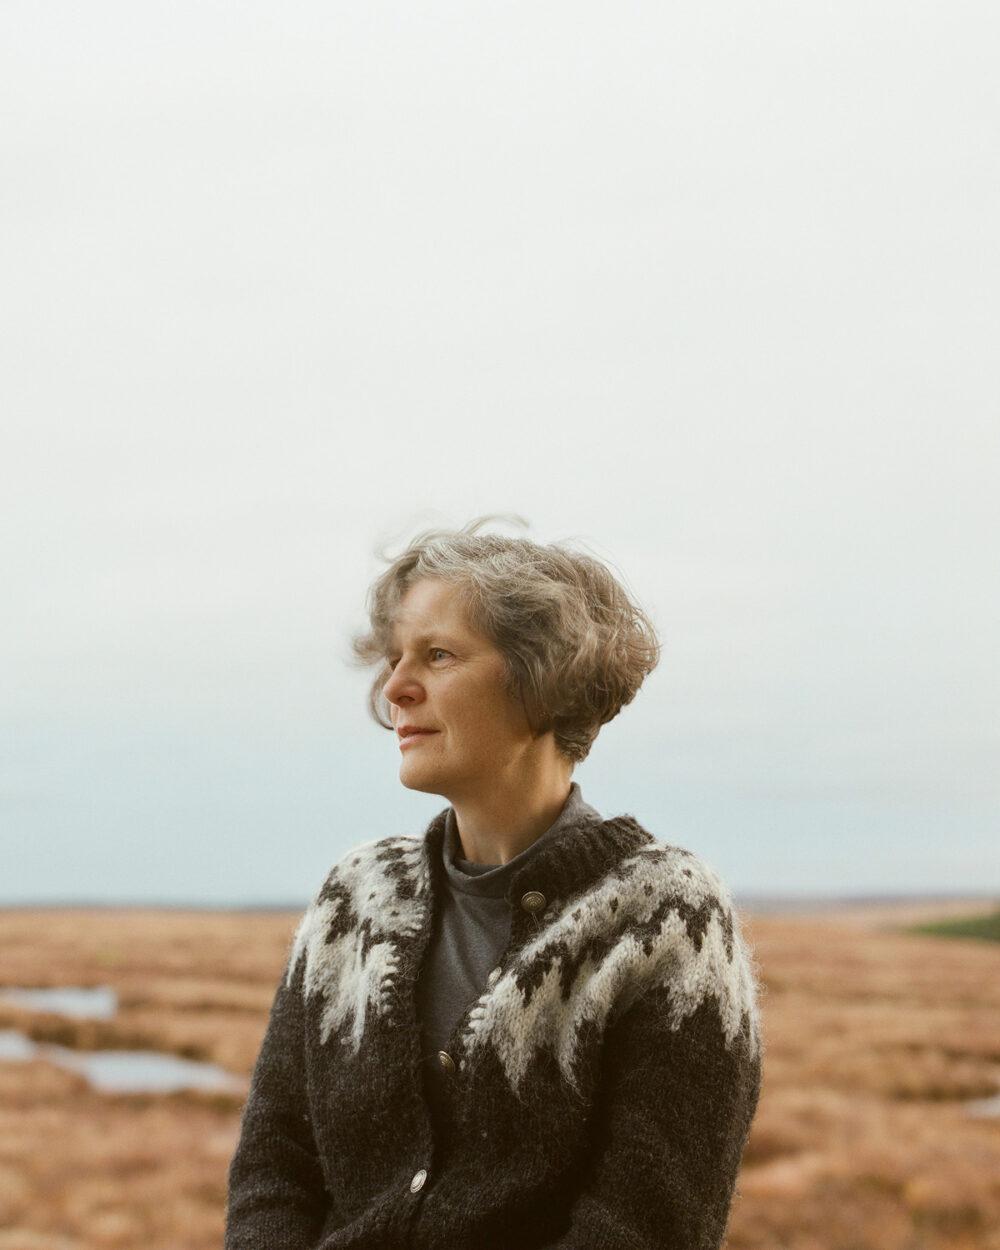 Caroline, peatlands management, from the series 'The Flows' © Sophie Gerrard 2019